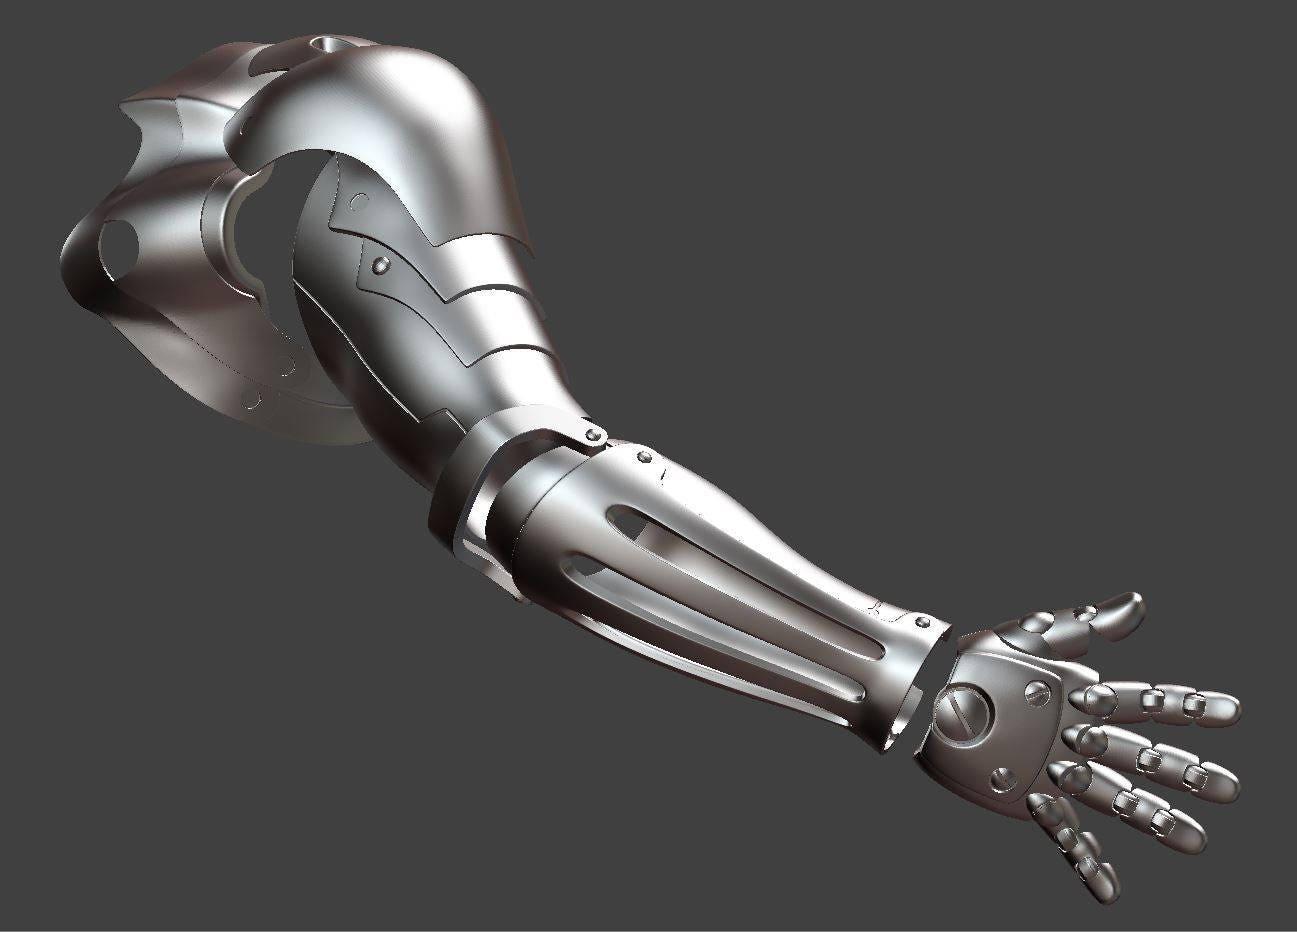 Edward Elric automail arm Fullmetal alchemist cosplay 3D ...